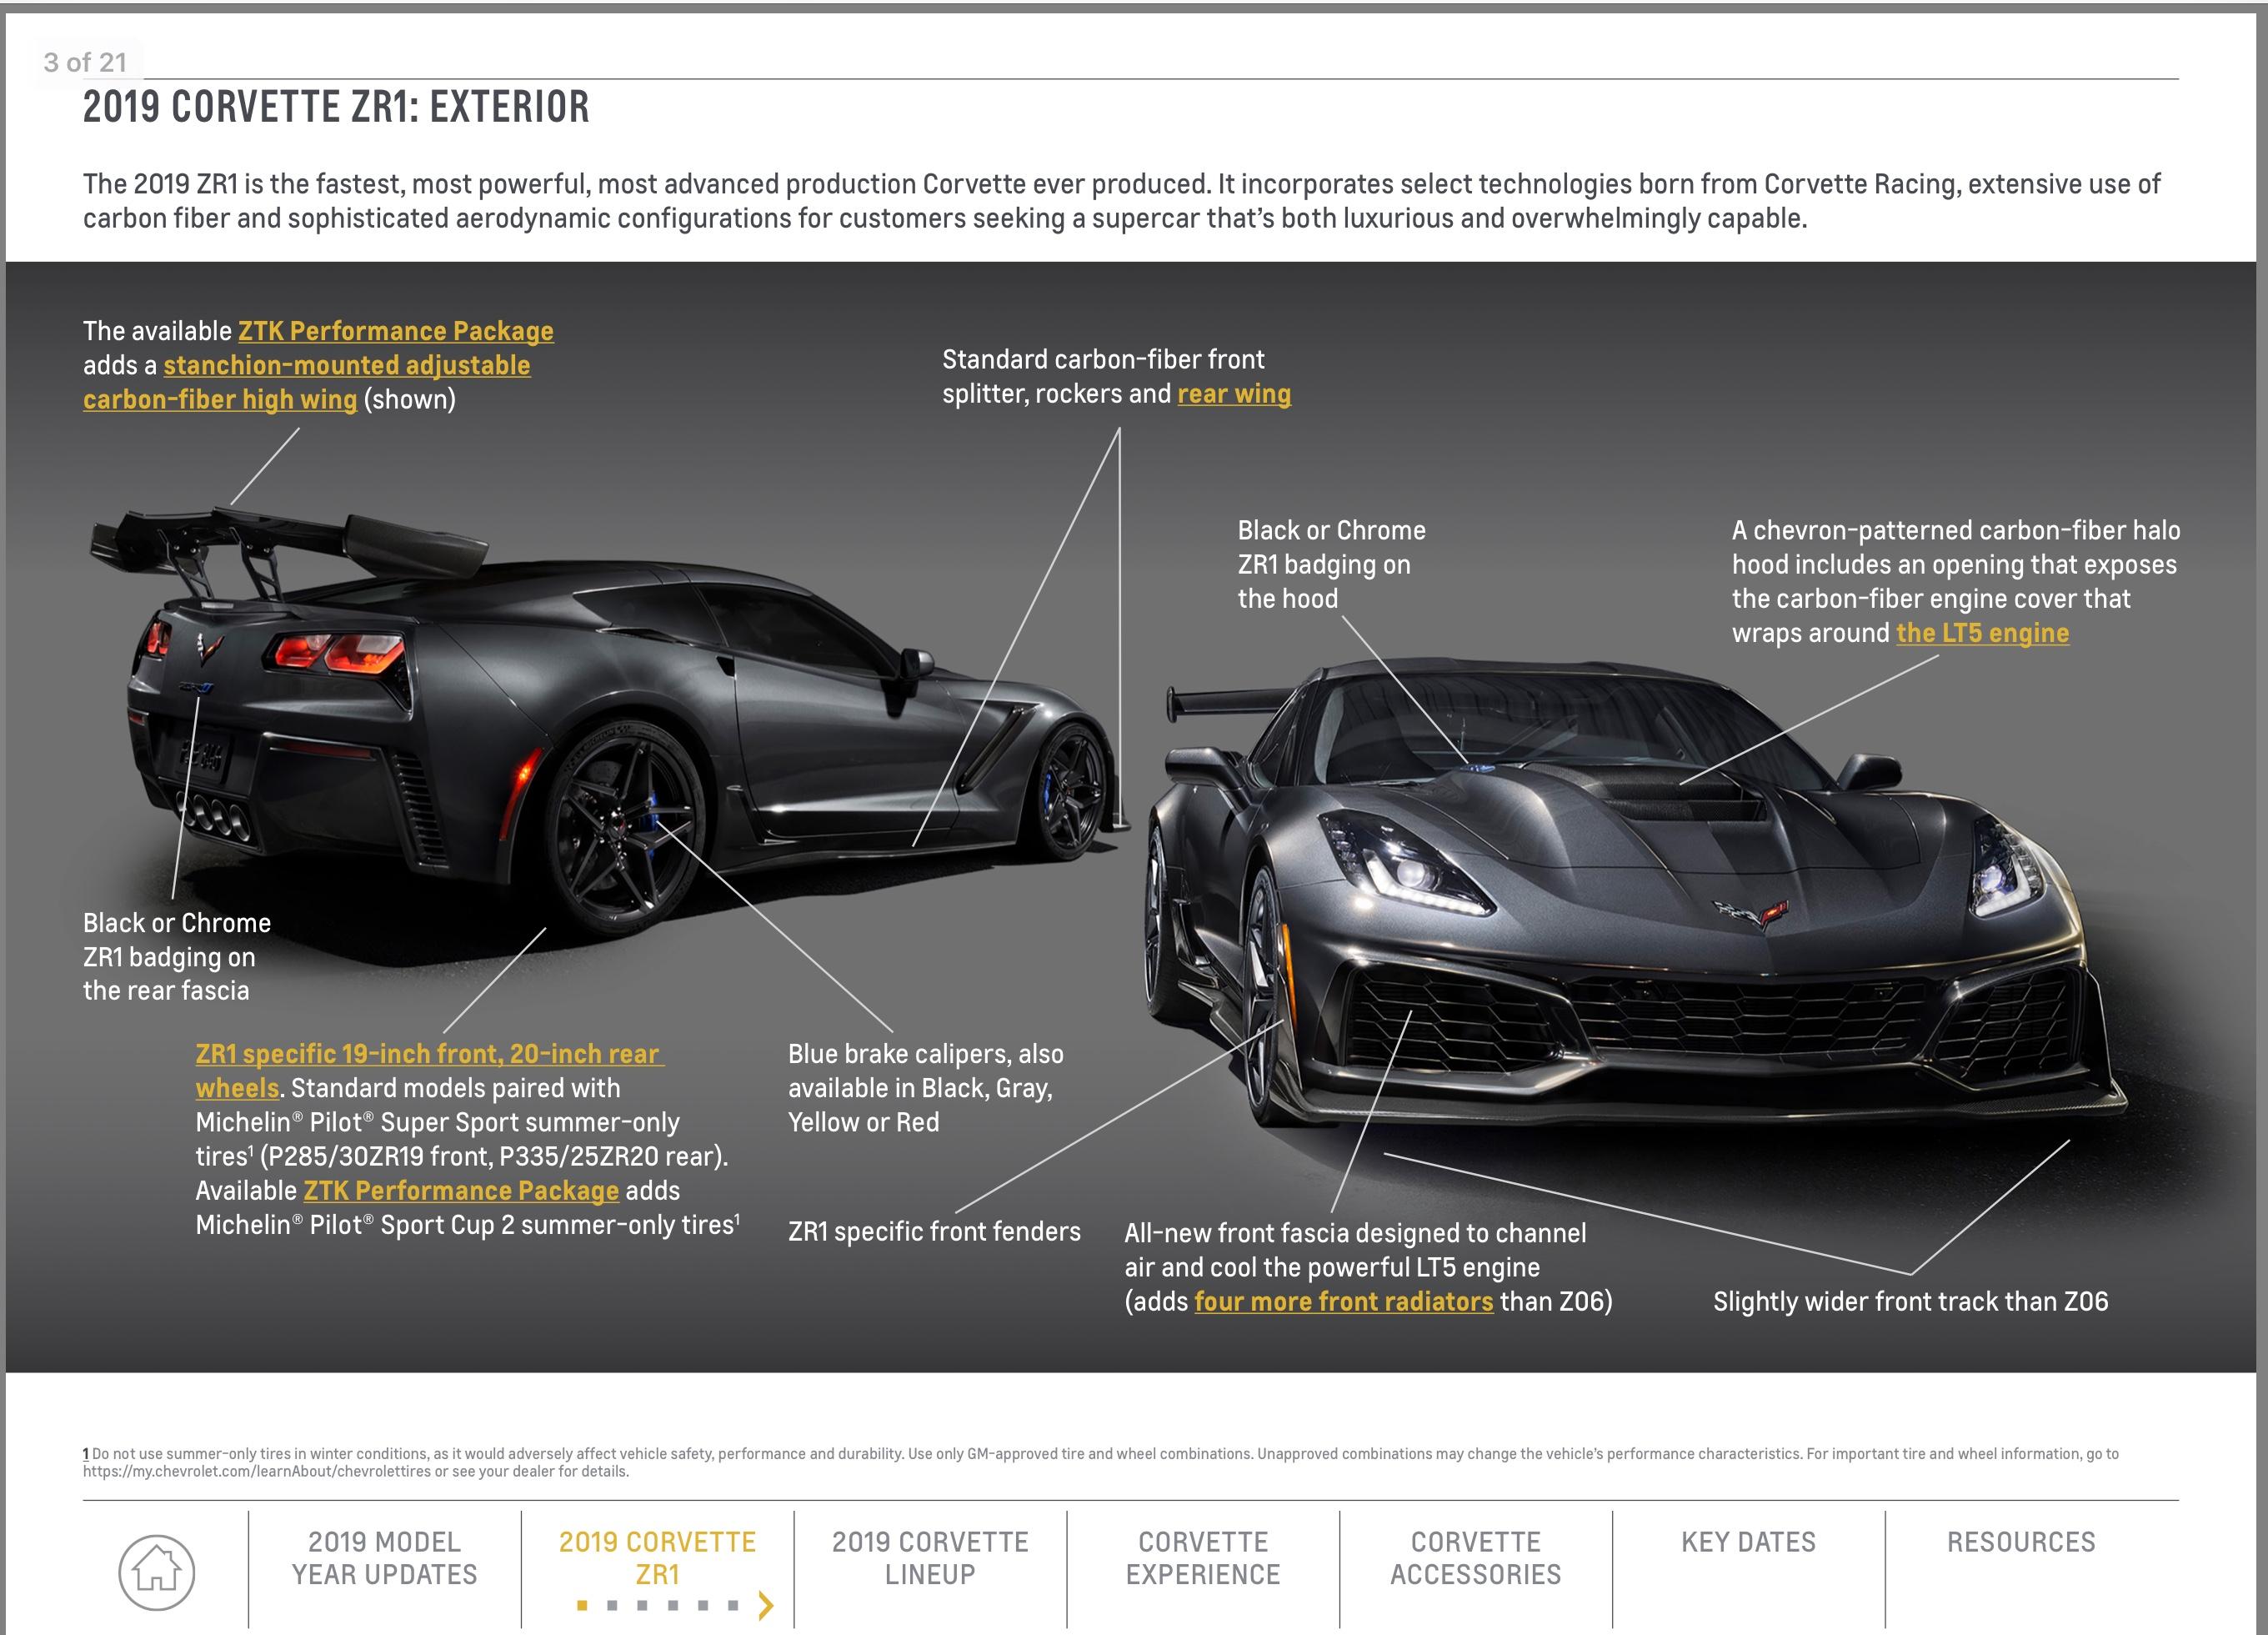 National Corvette Museum >> GM: 2019 Corvette Playbook